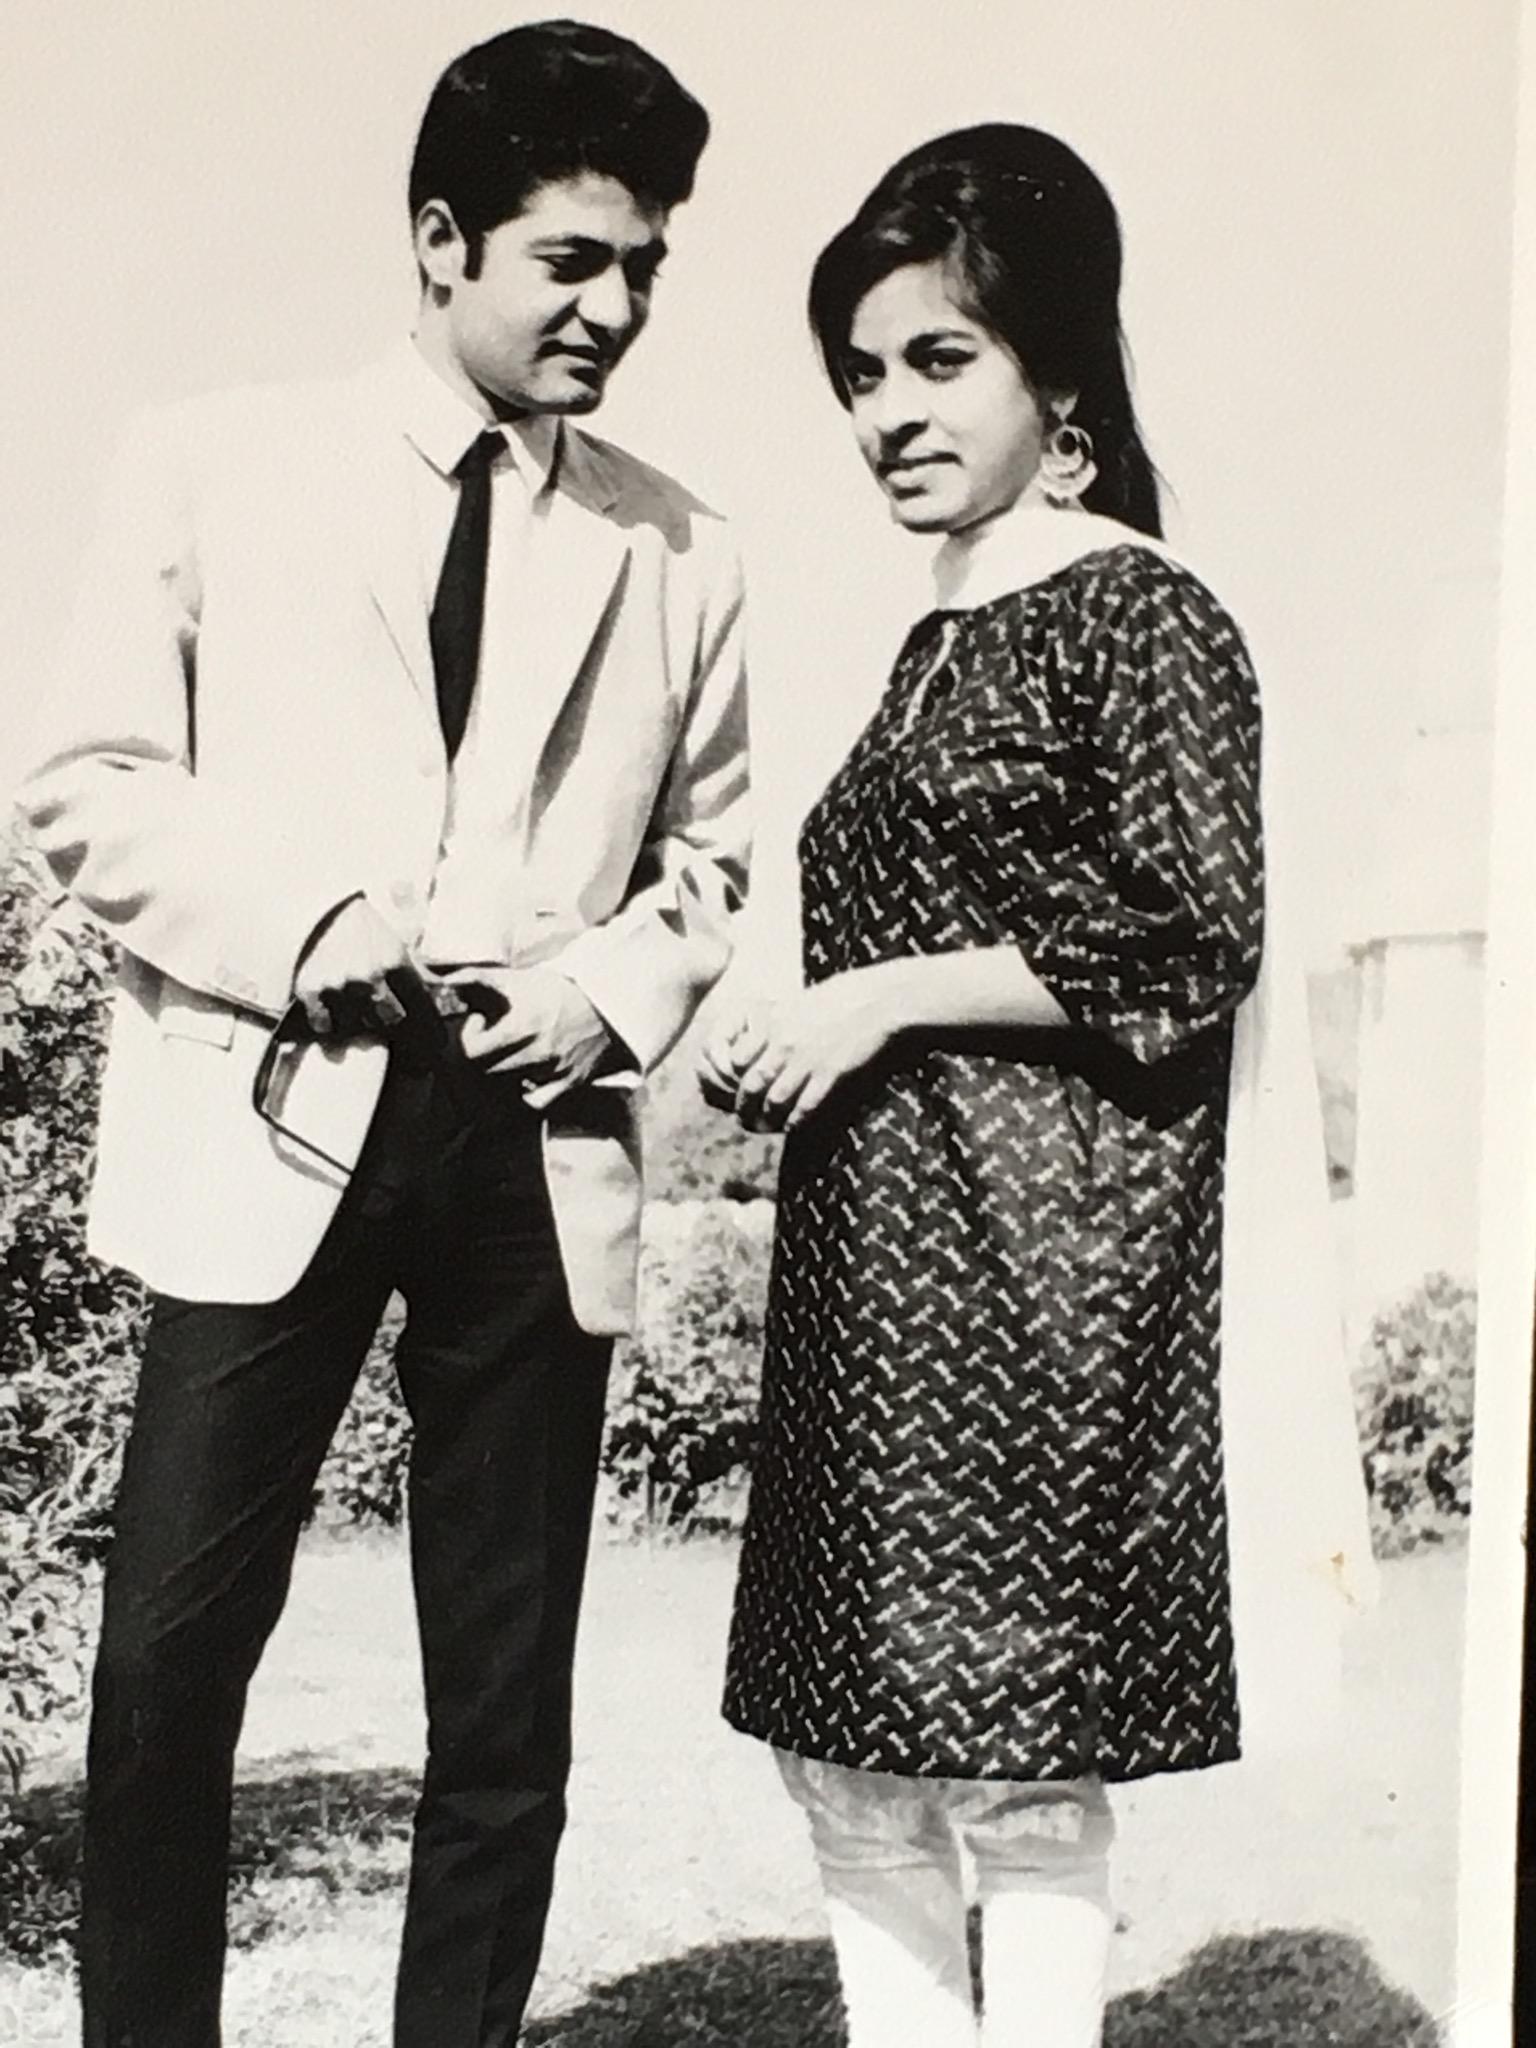 Sat and Padma Mahajan  (Photo is provided as a courtesy to The $8 Man and is the property of Sat Mahajan)